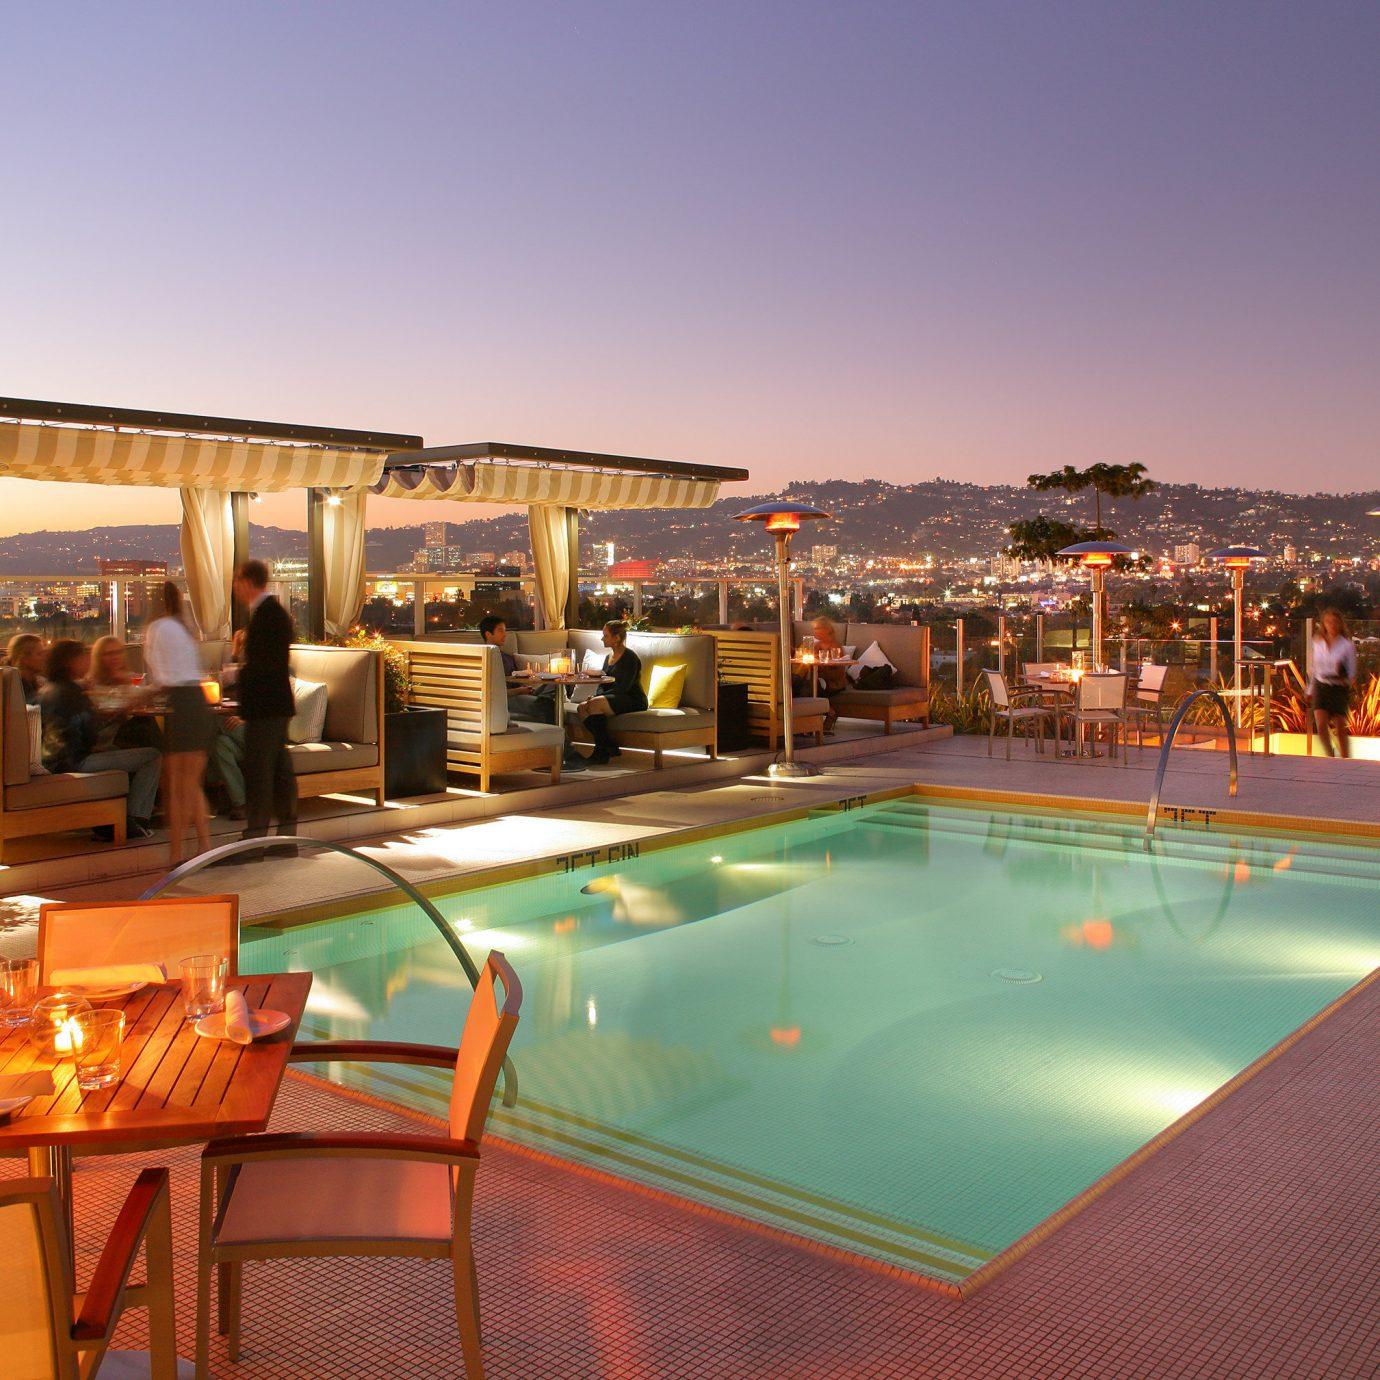 sky leisure property Resort swimming pool